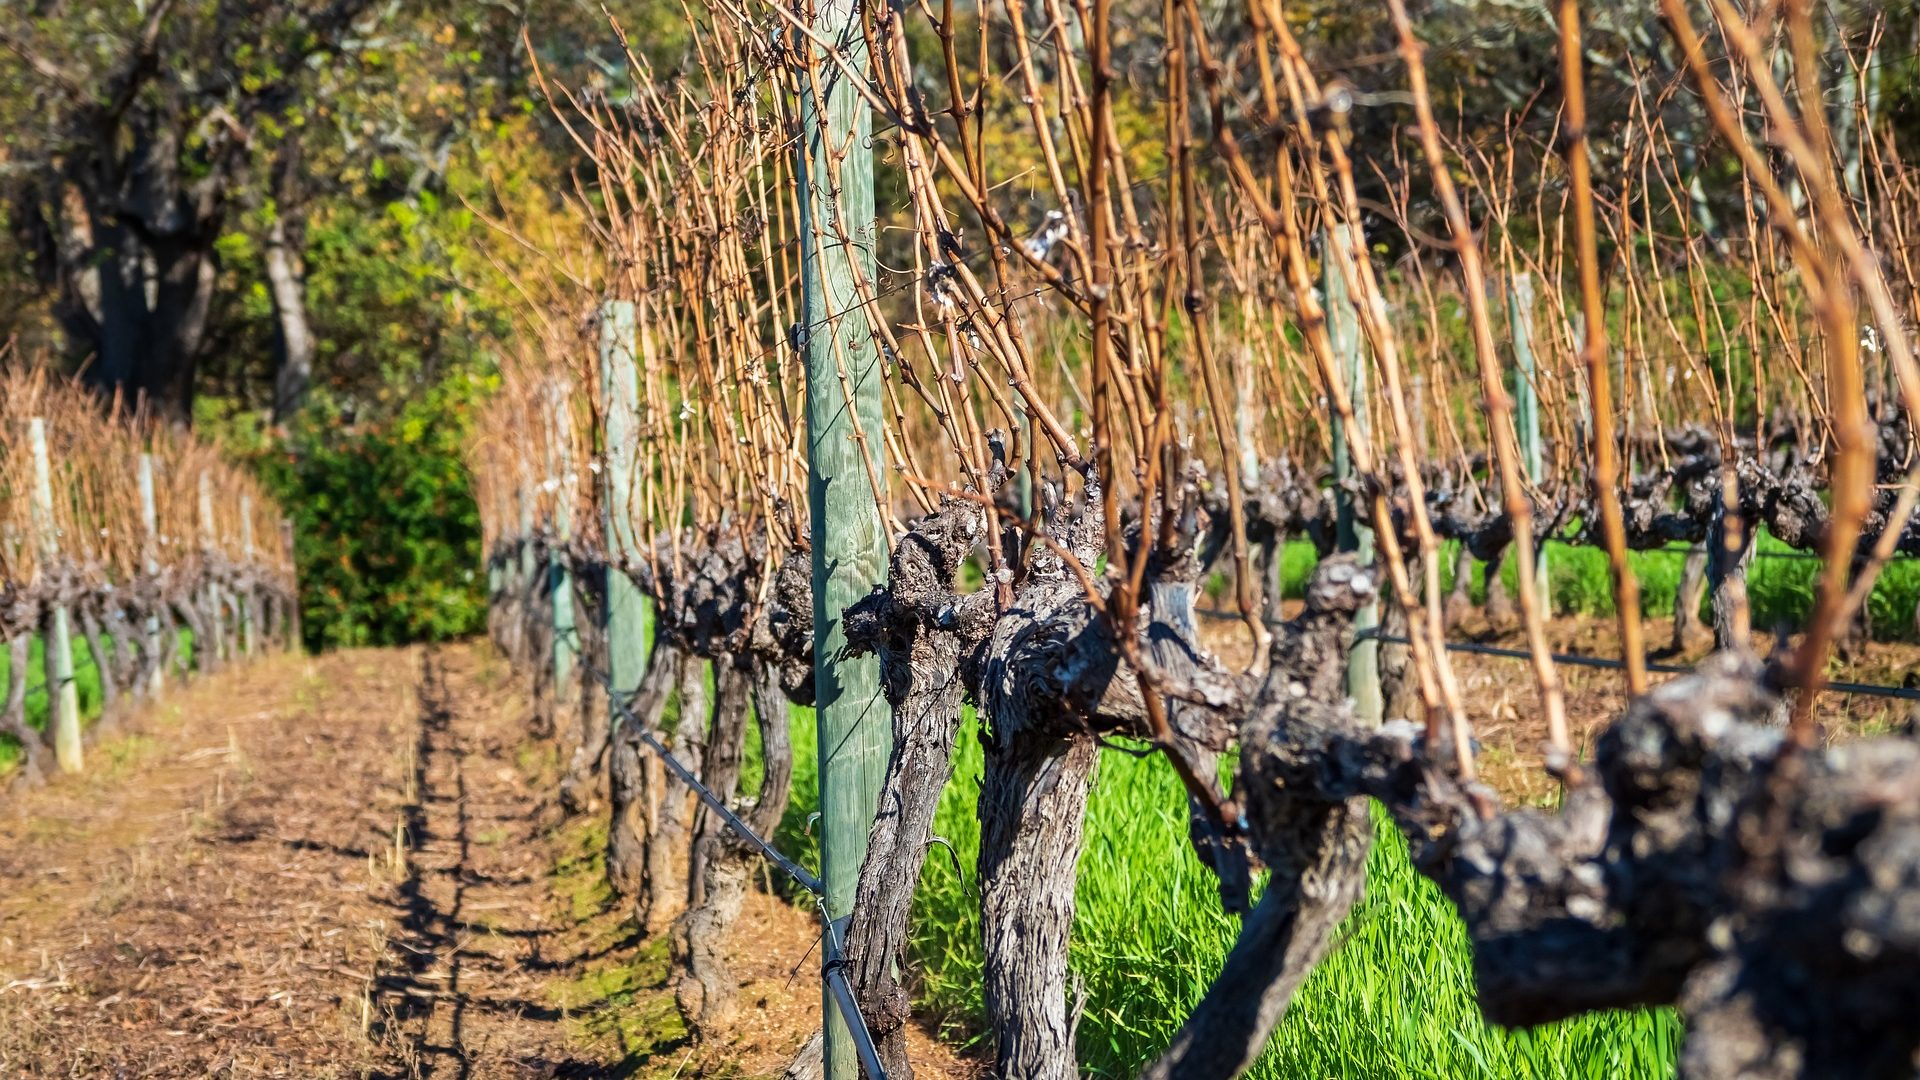 grape-vines-3589423_1920